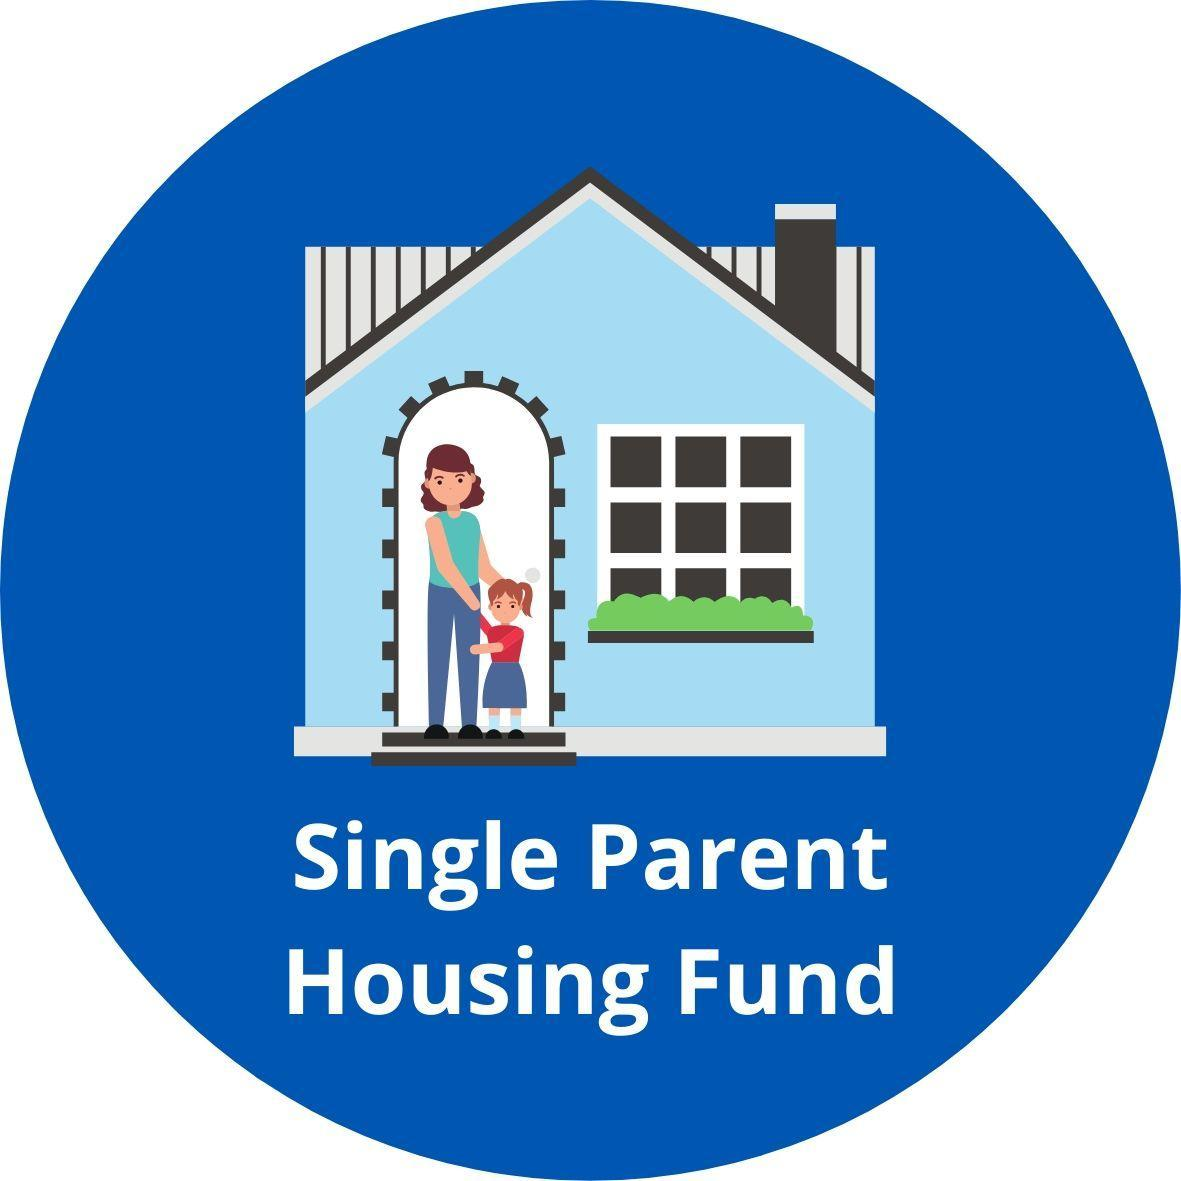 Single Parents Housing Fund